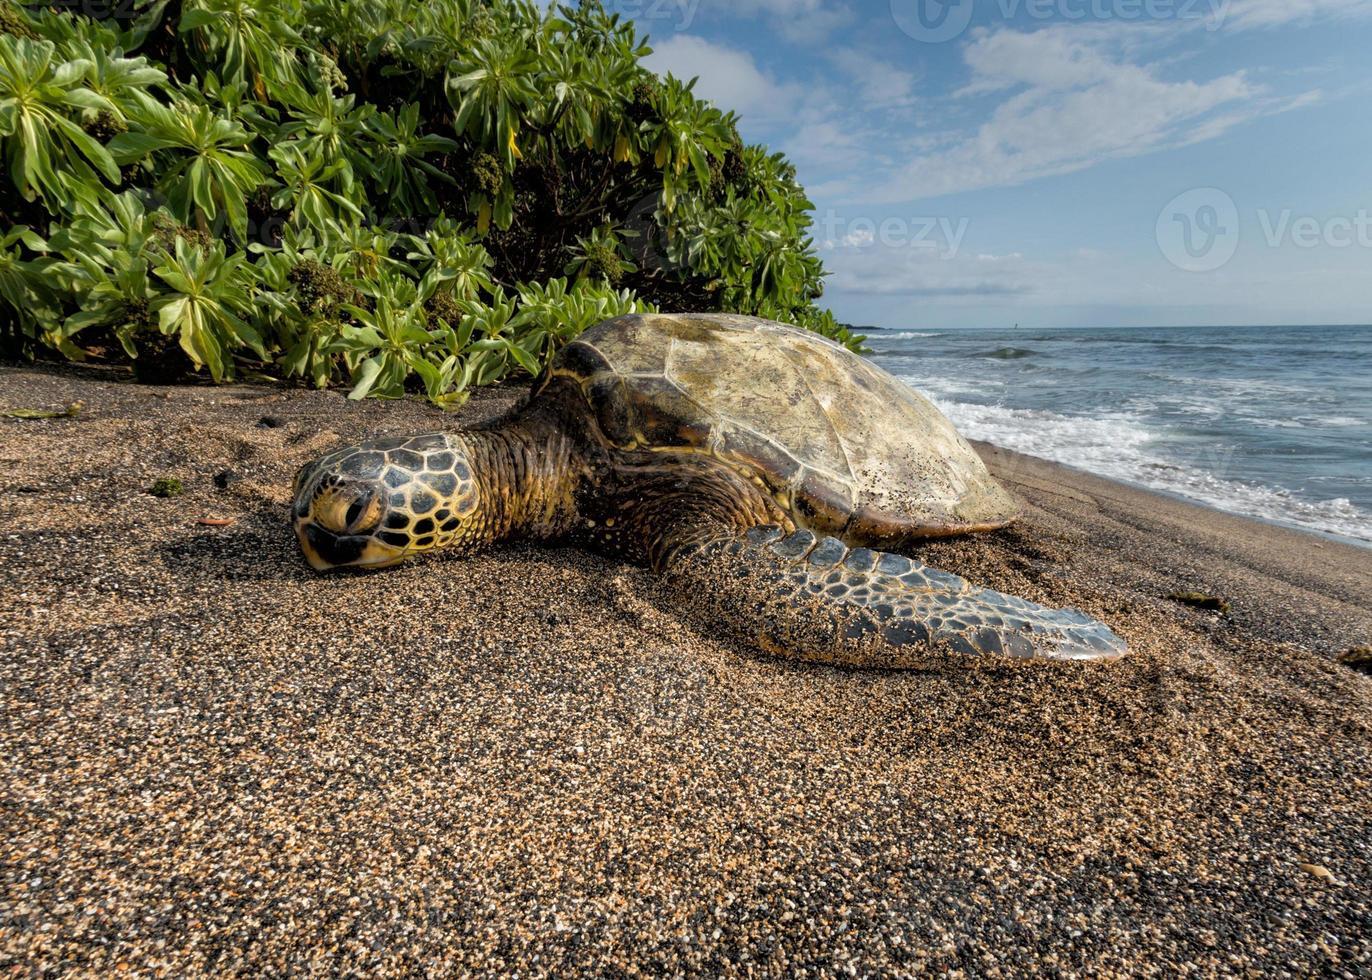 Green Turtle on the beach in Hawaii photo